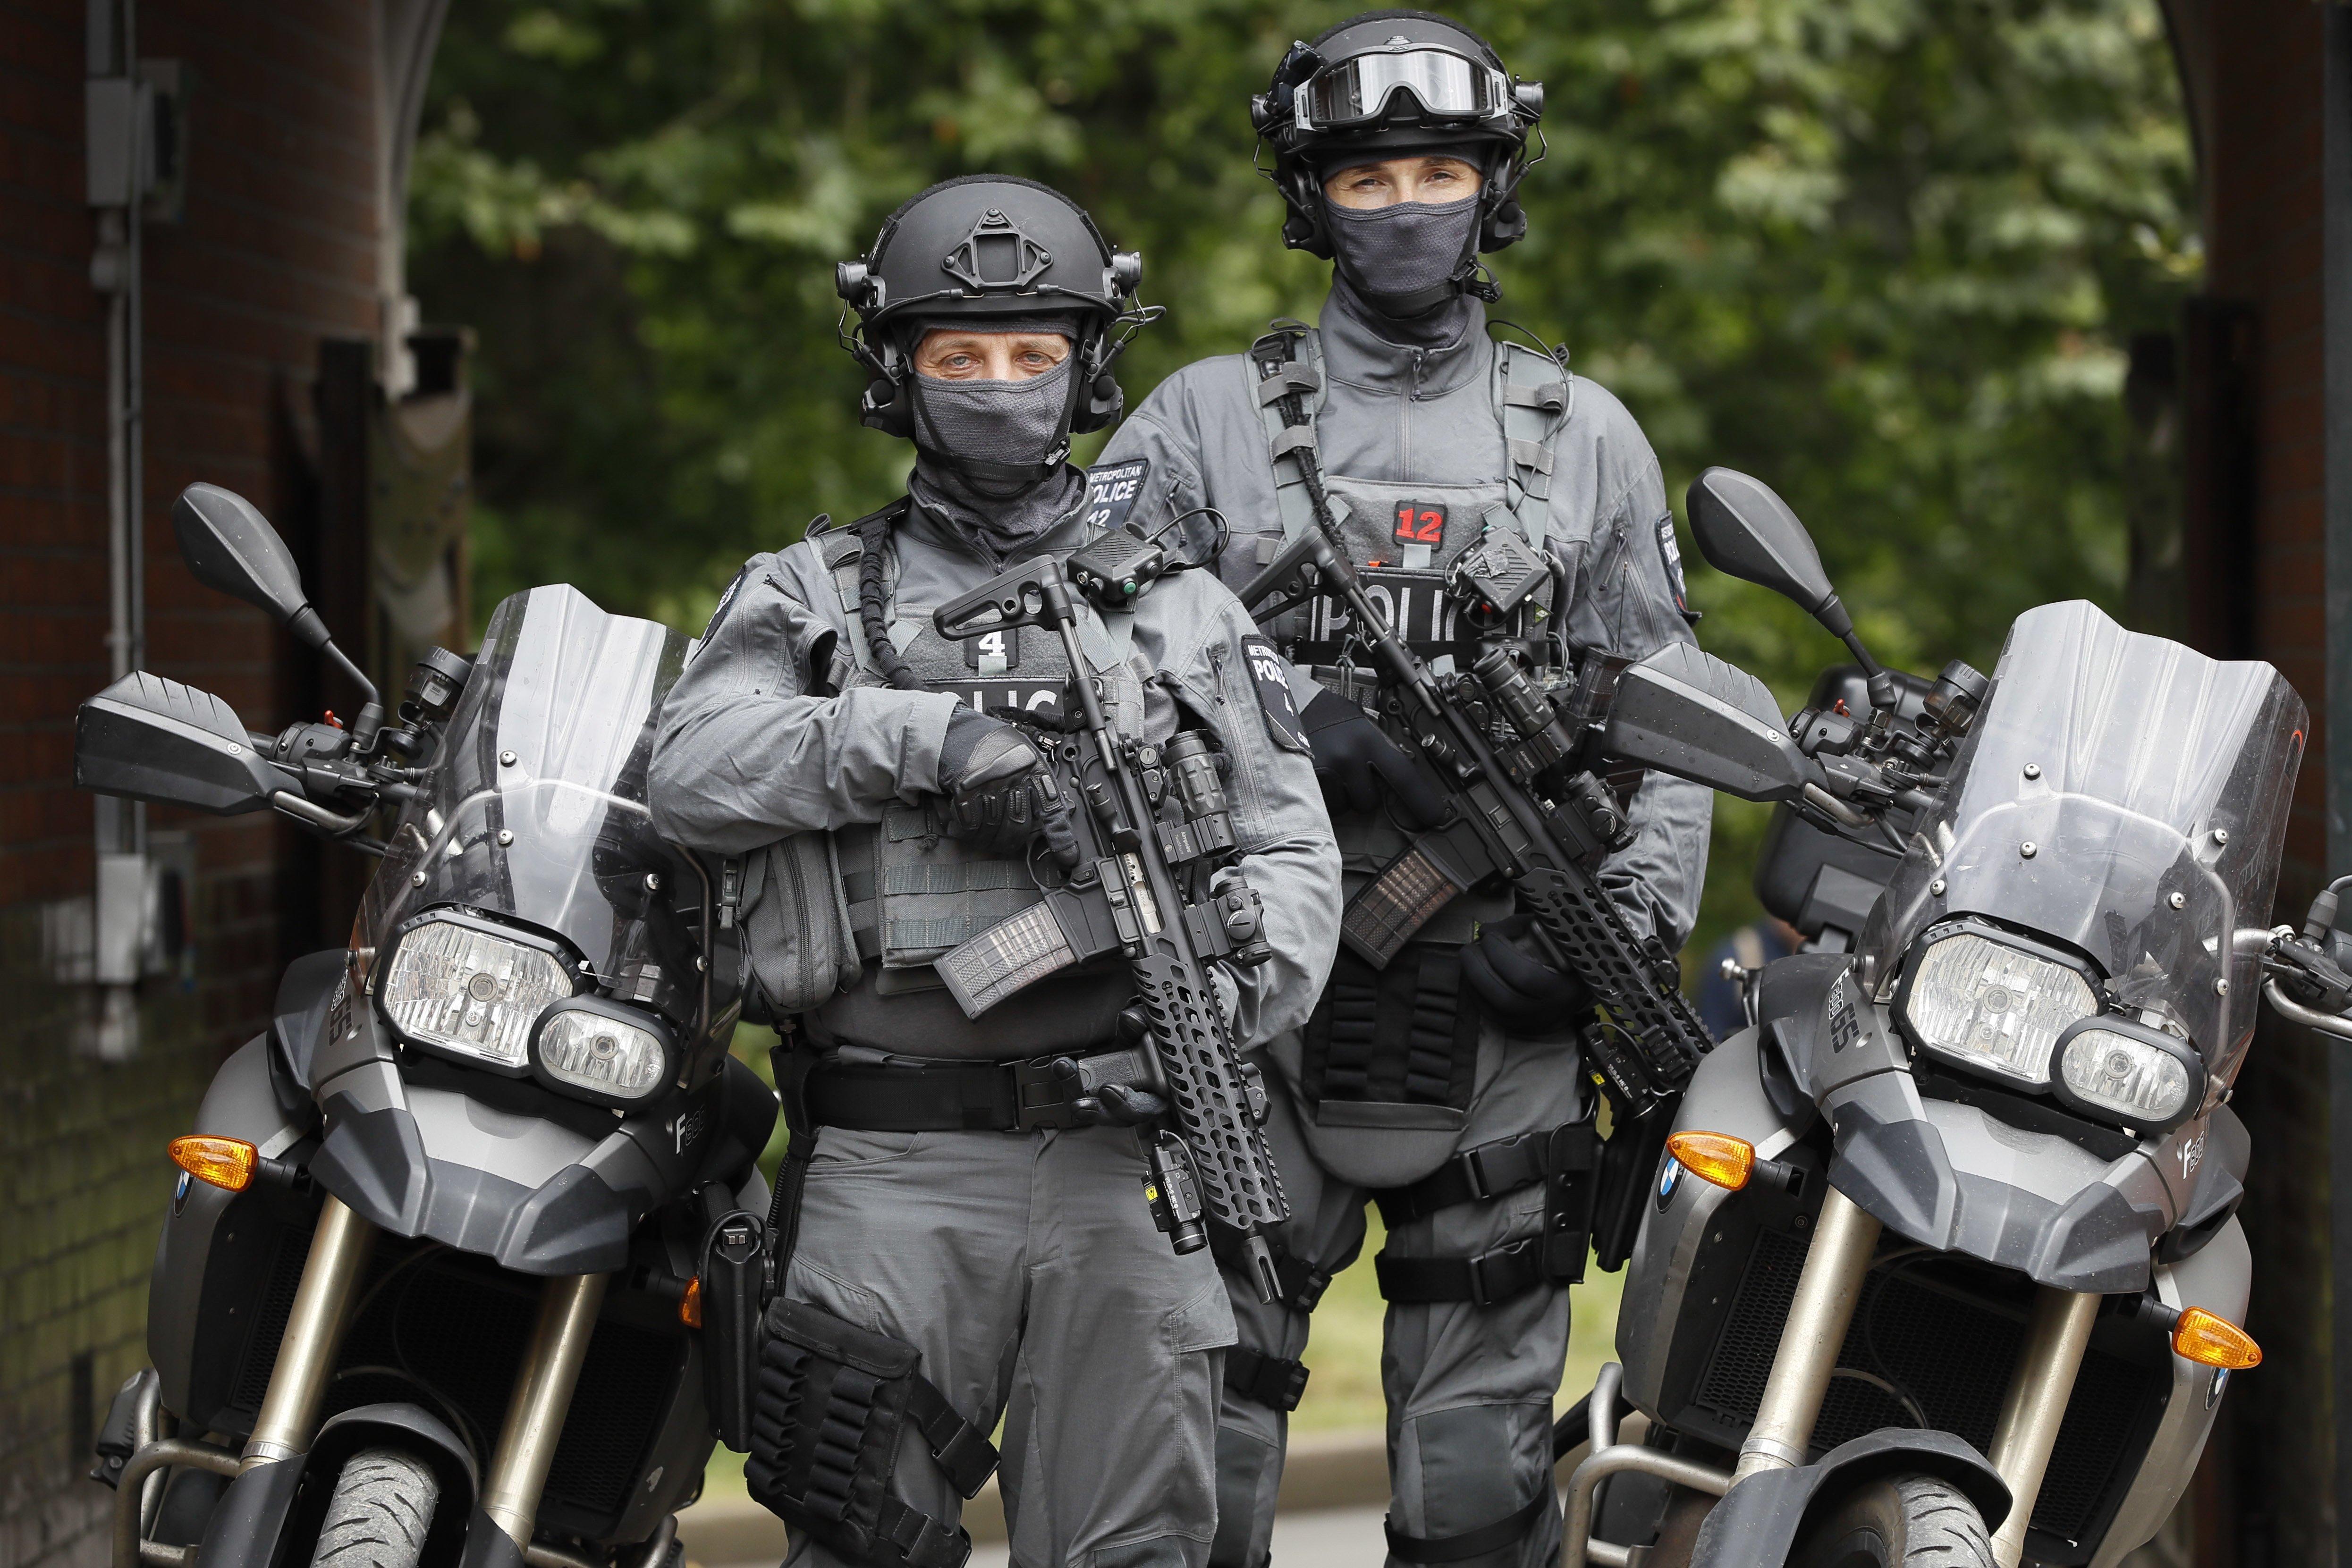 Image: Counterterrorism officers